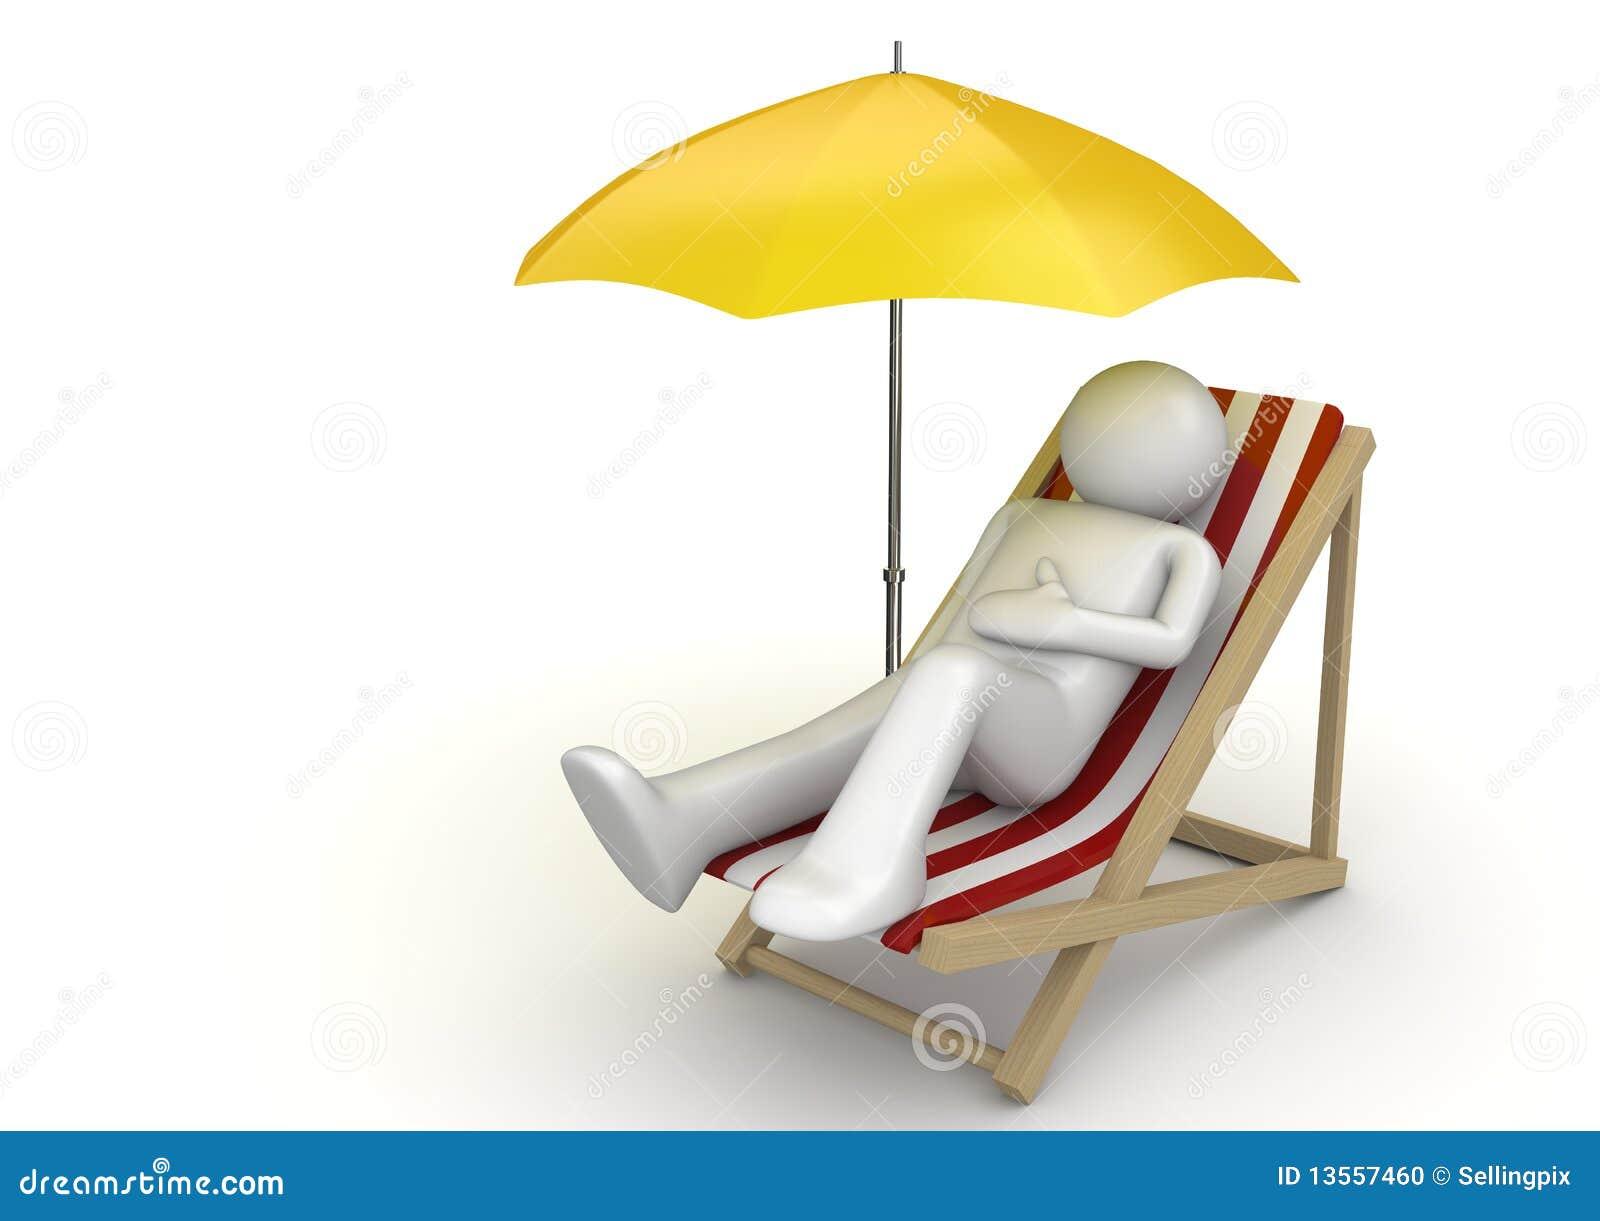 Beach chair with umbrella - Man Lying On A Beach Chair Ynder Umbrella Stock Photo